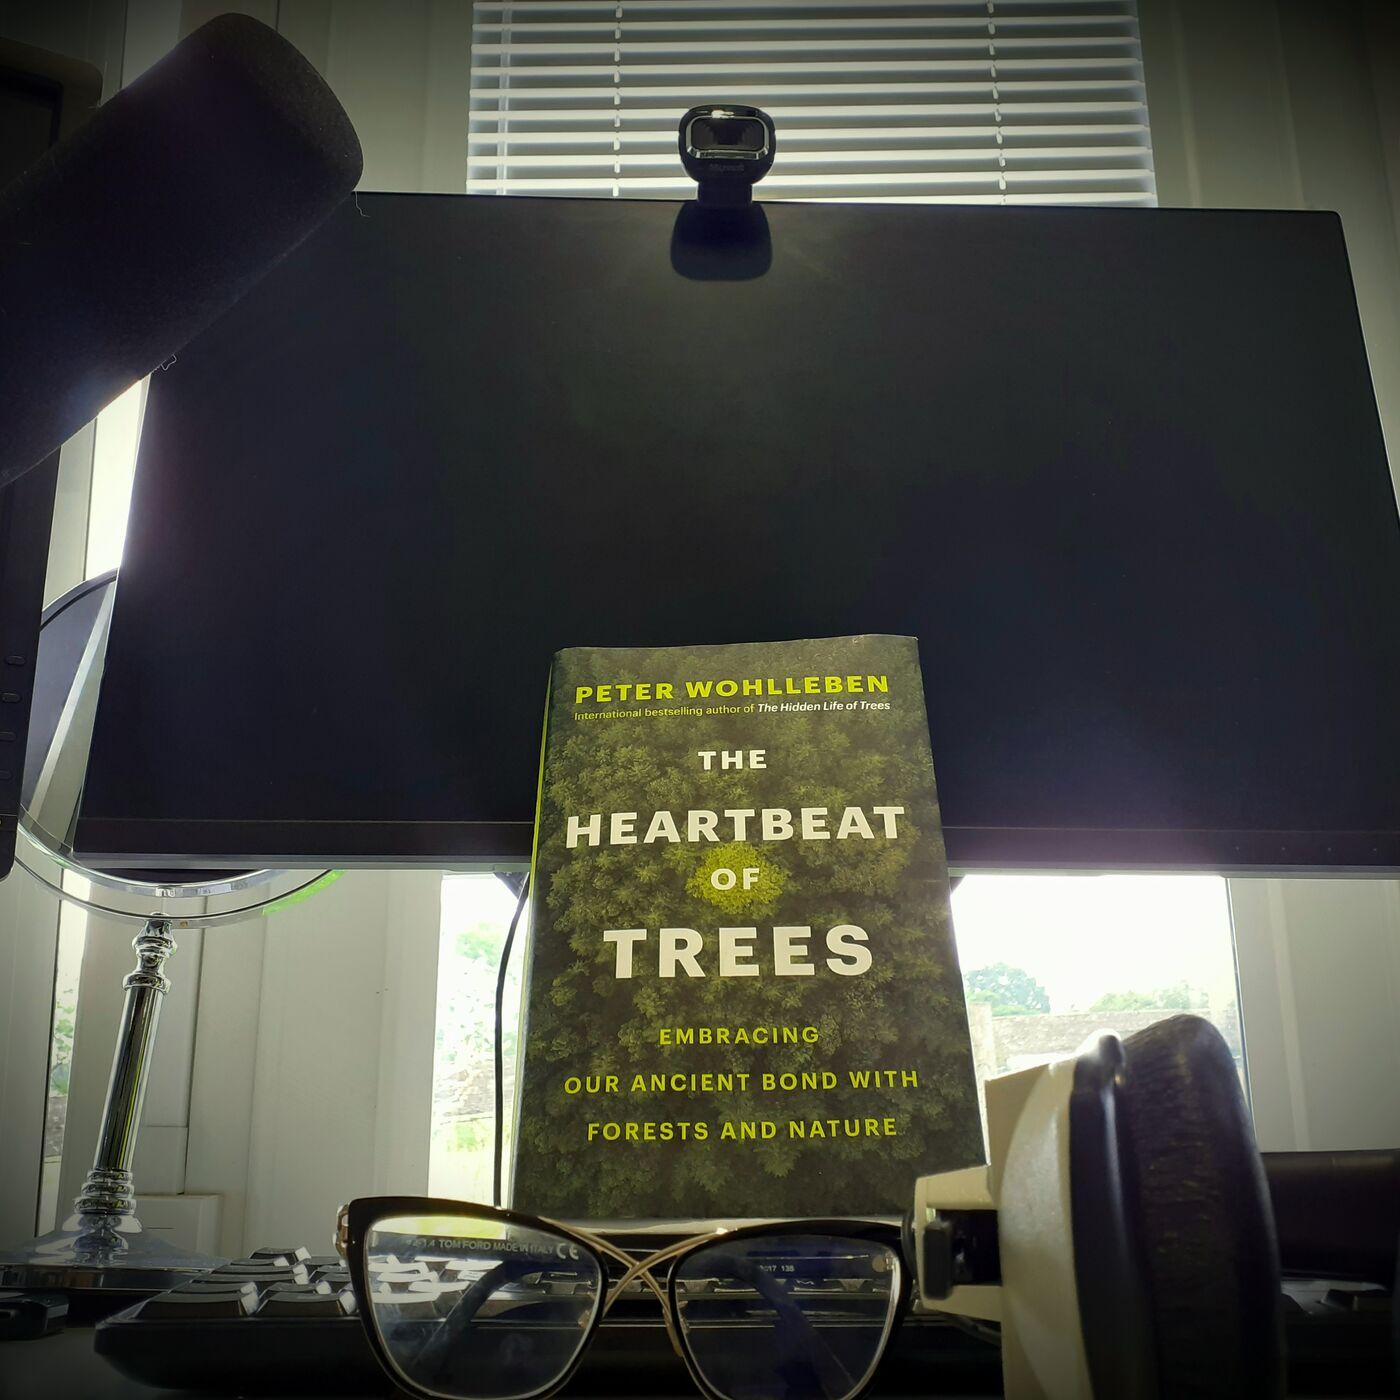 Peter Wohlleben - The Heartbeat Of Trees Soundbite